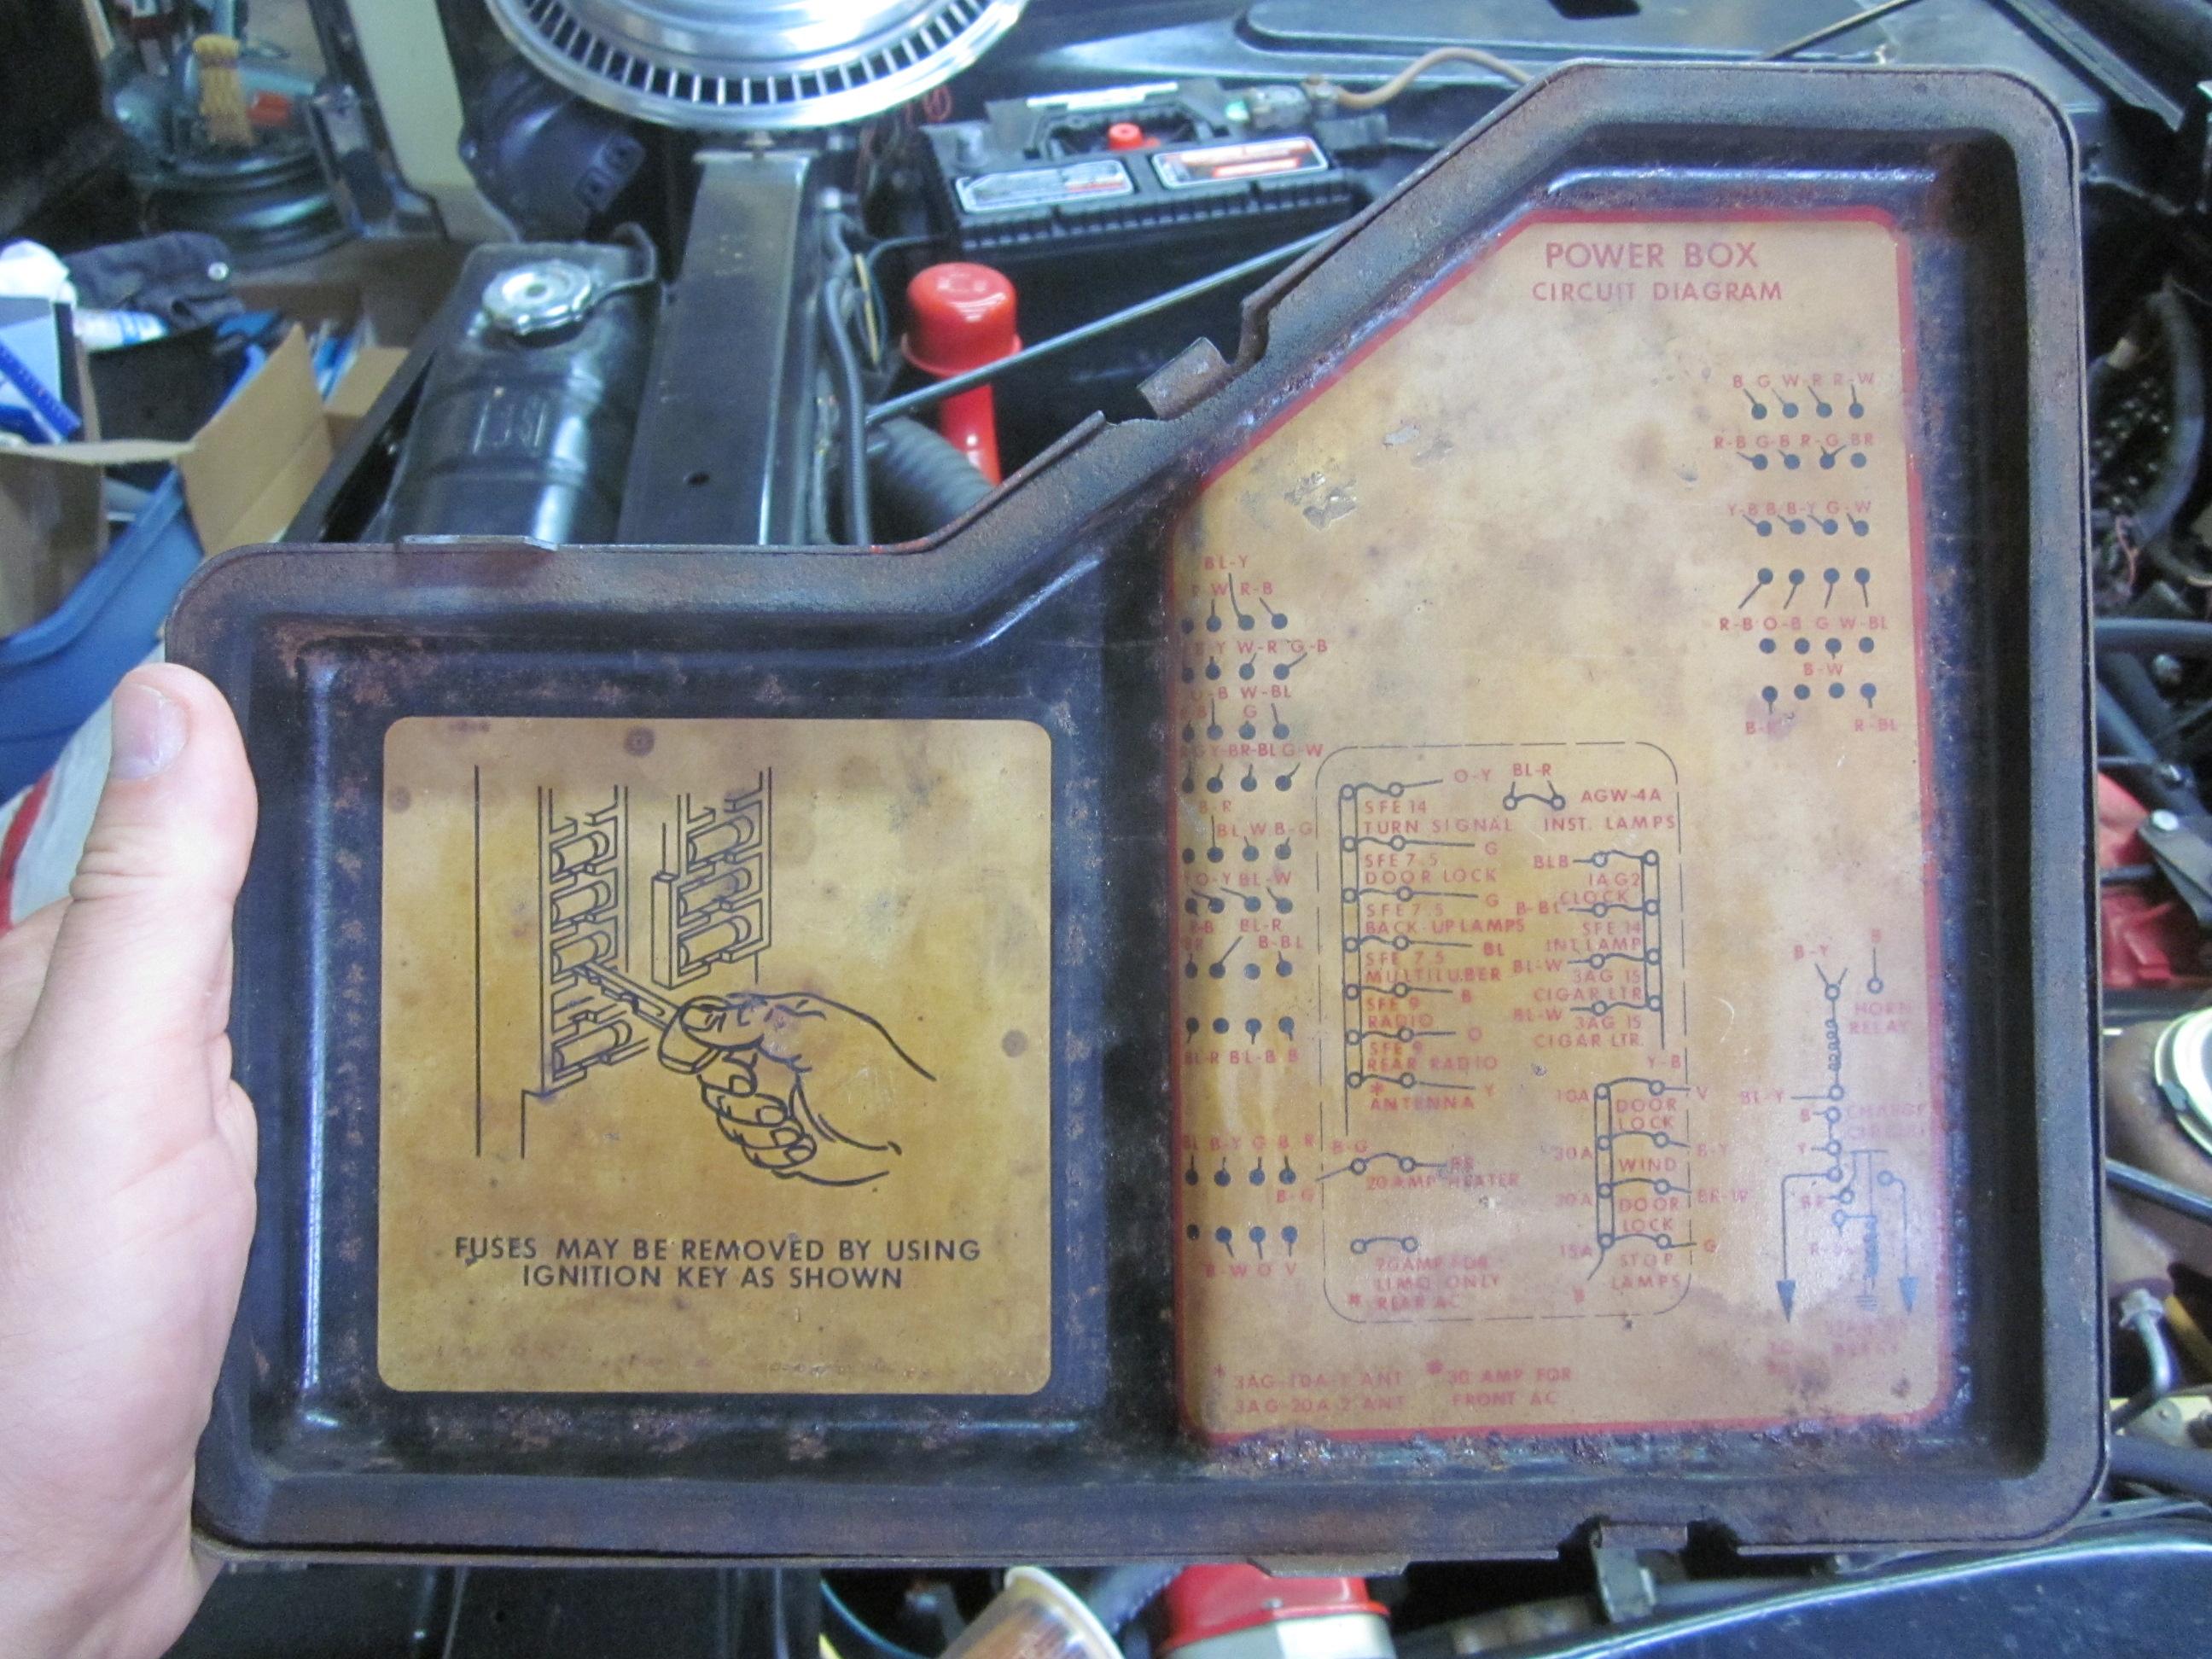 1960 lincoln wiring diagram mv 1590  1960 lincoln wiring diagram  mv 1590  1960 lincoln wiring diagram